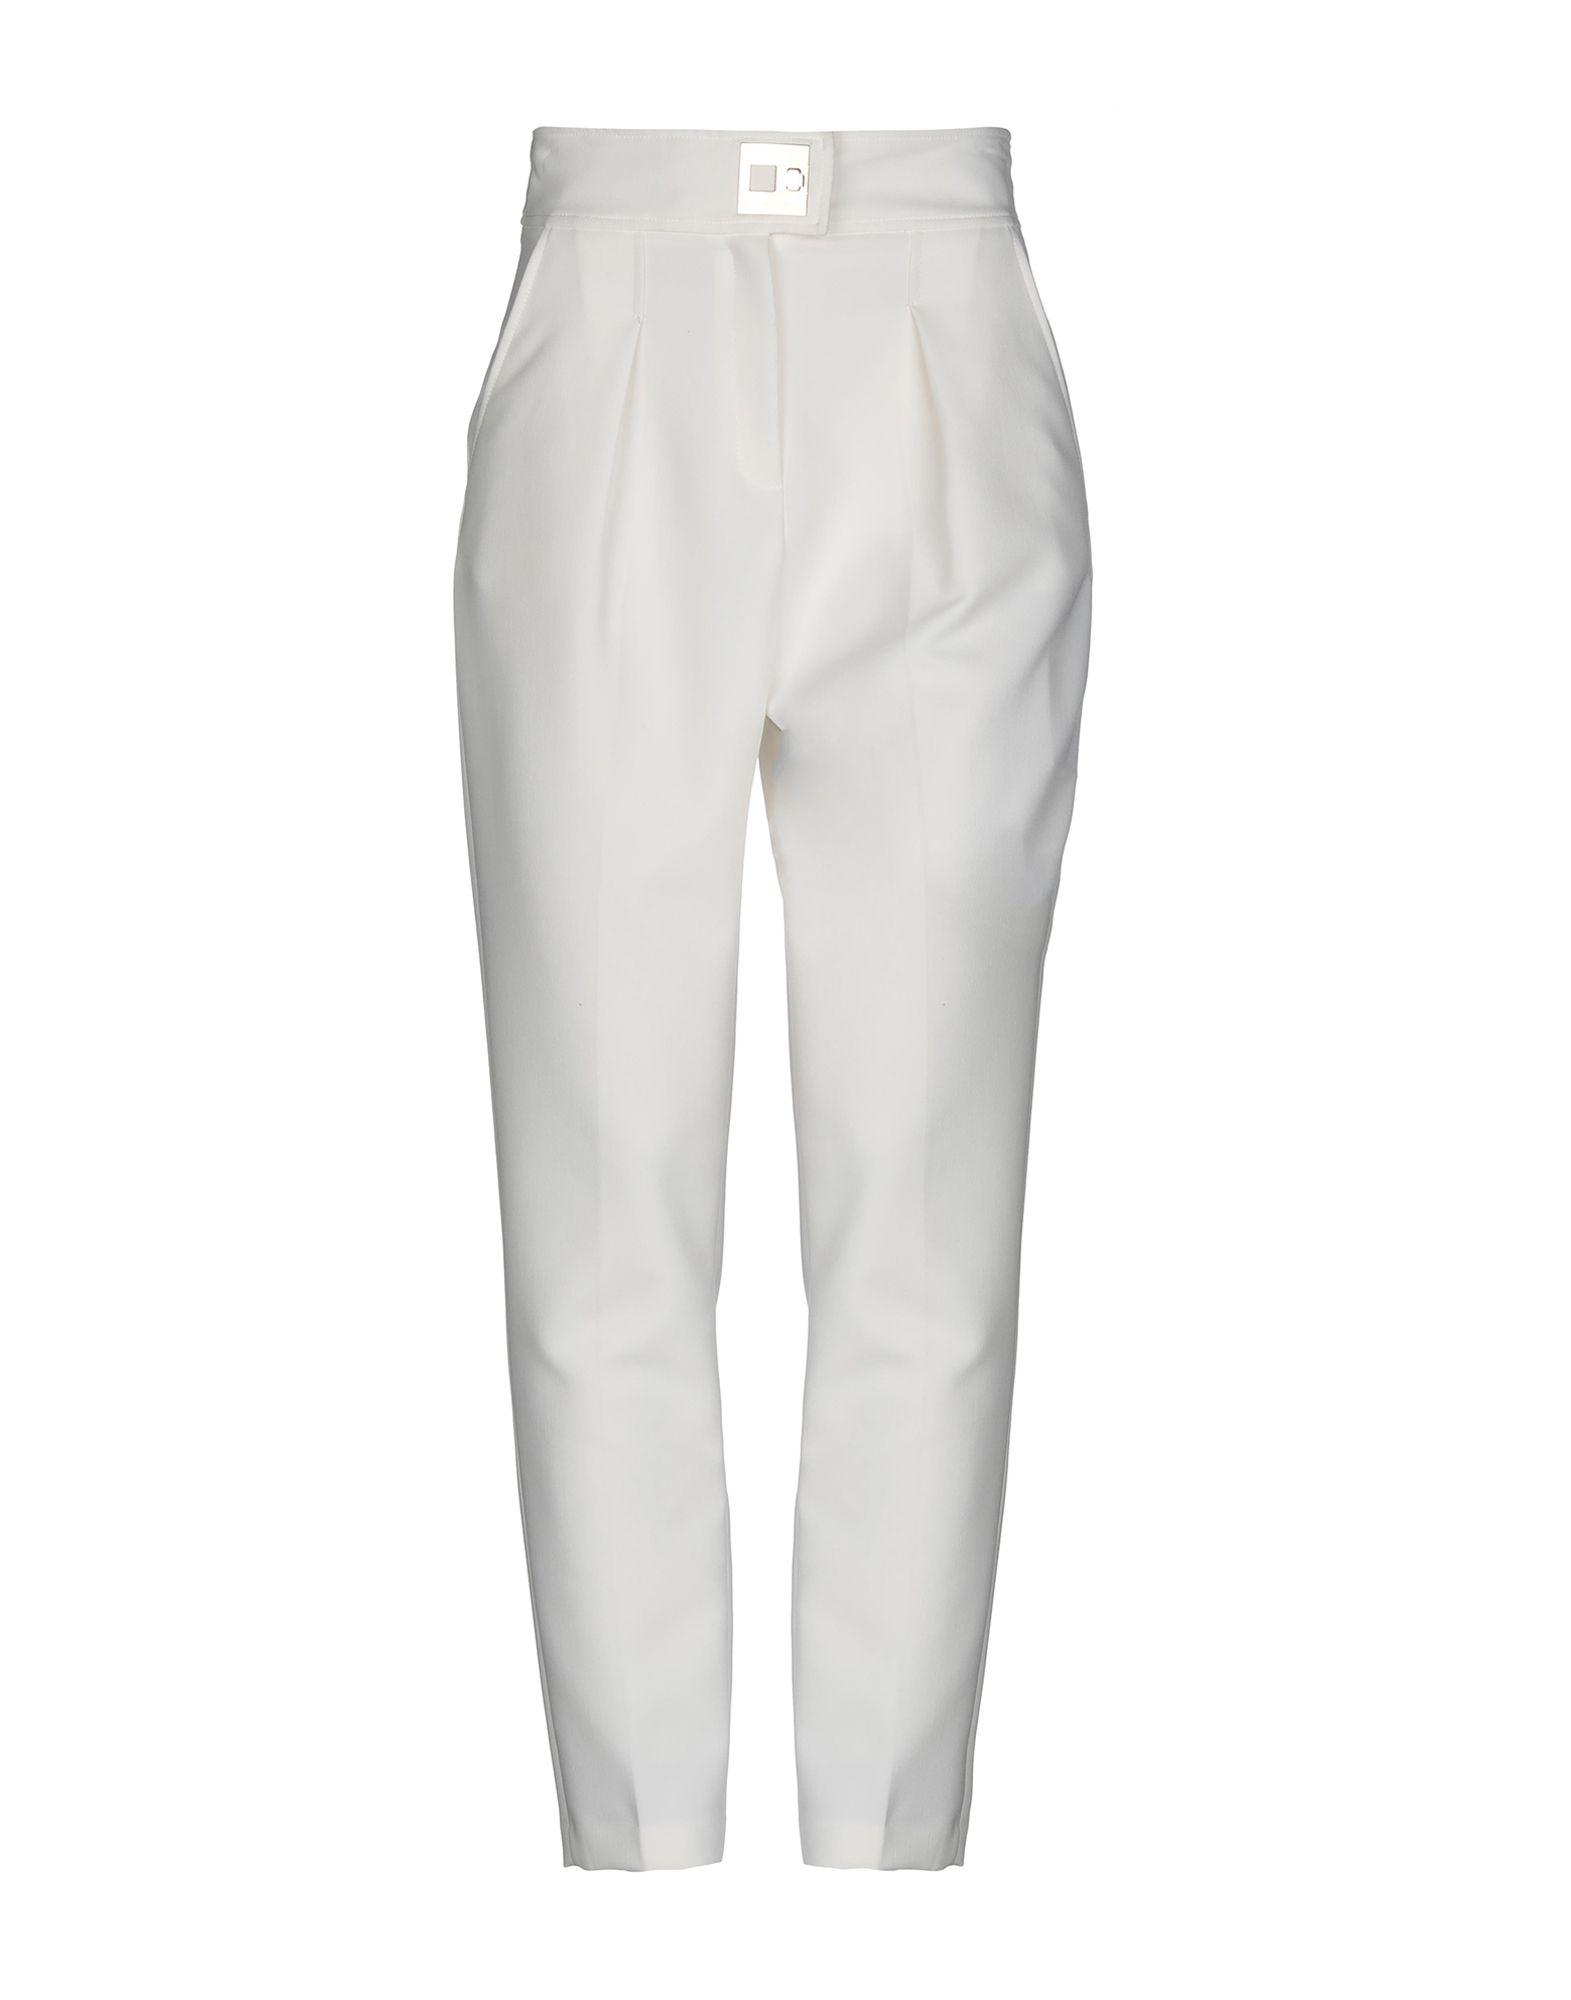 Pantalone Elisabetta Fran  24 Ore donna - - 13236810FE